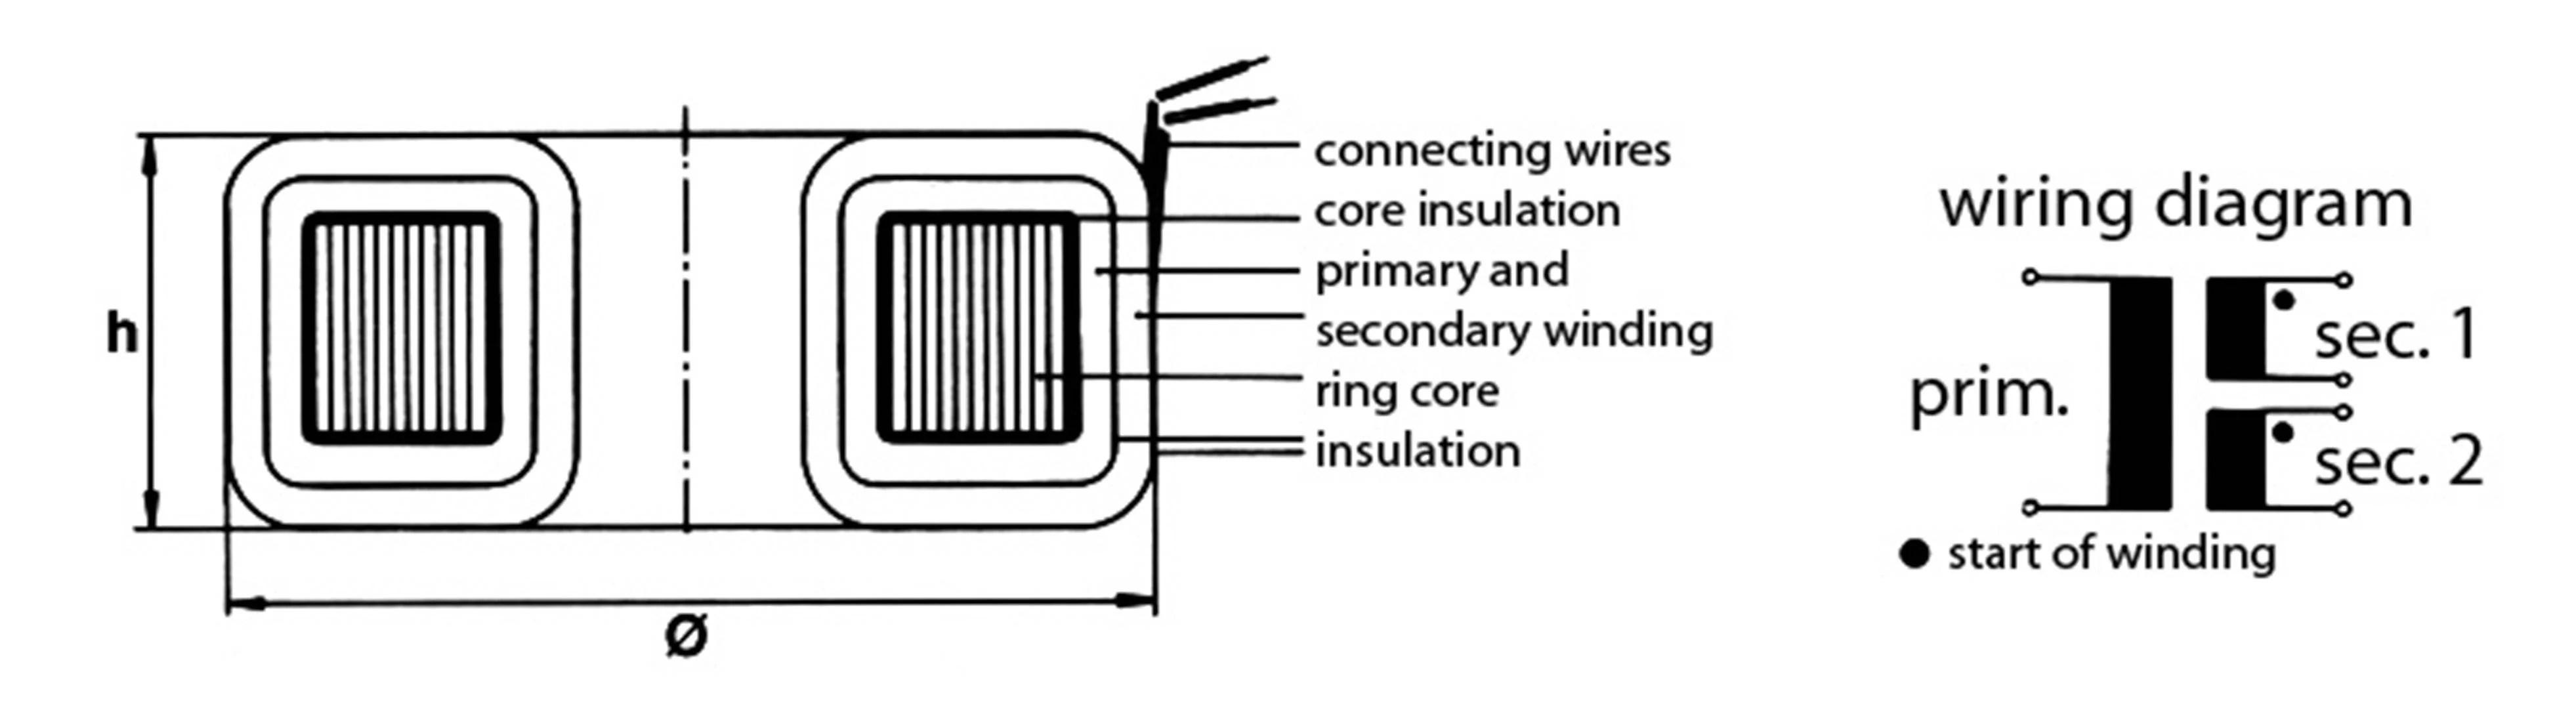 hight resolution of 2x15 wiring diagram wiring diagram paper cd15 new racing cdi wiring diagram